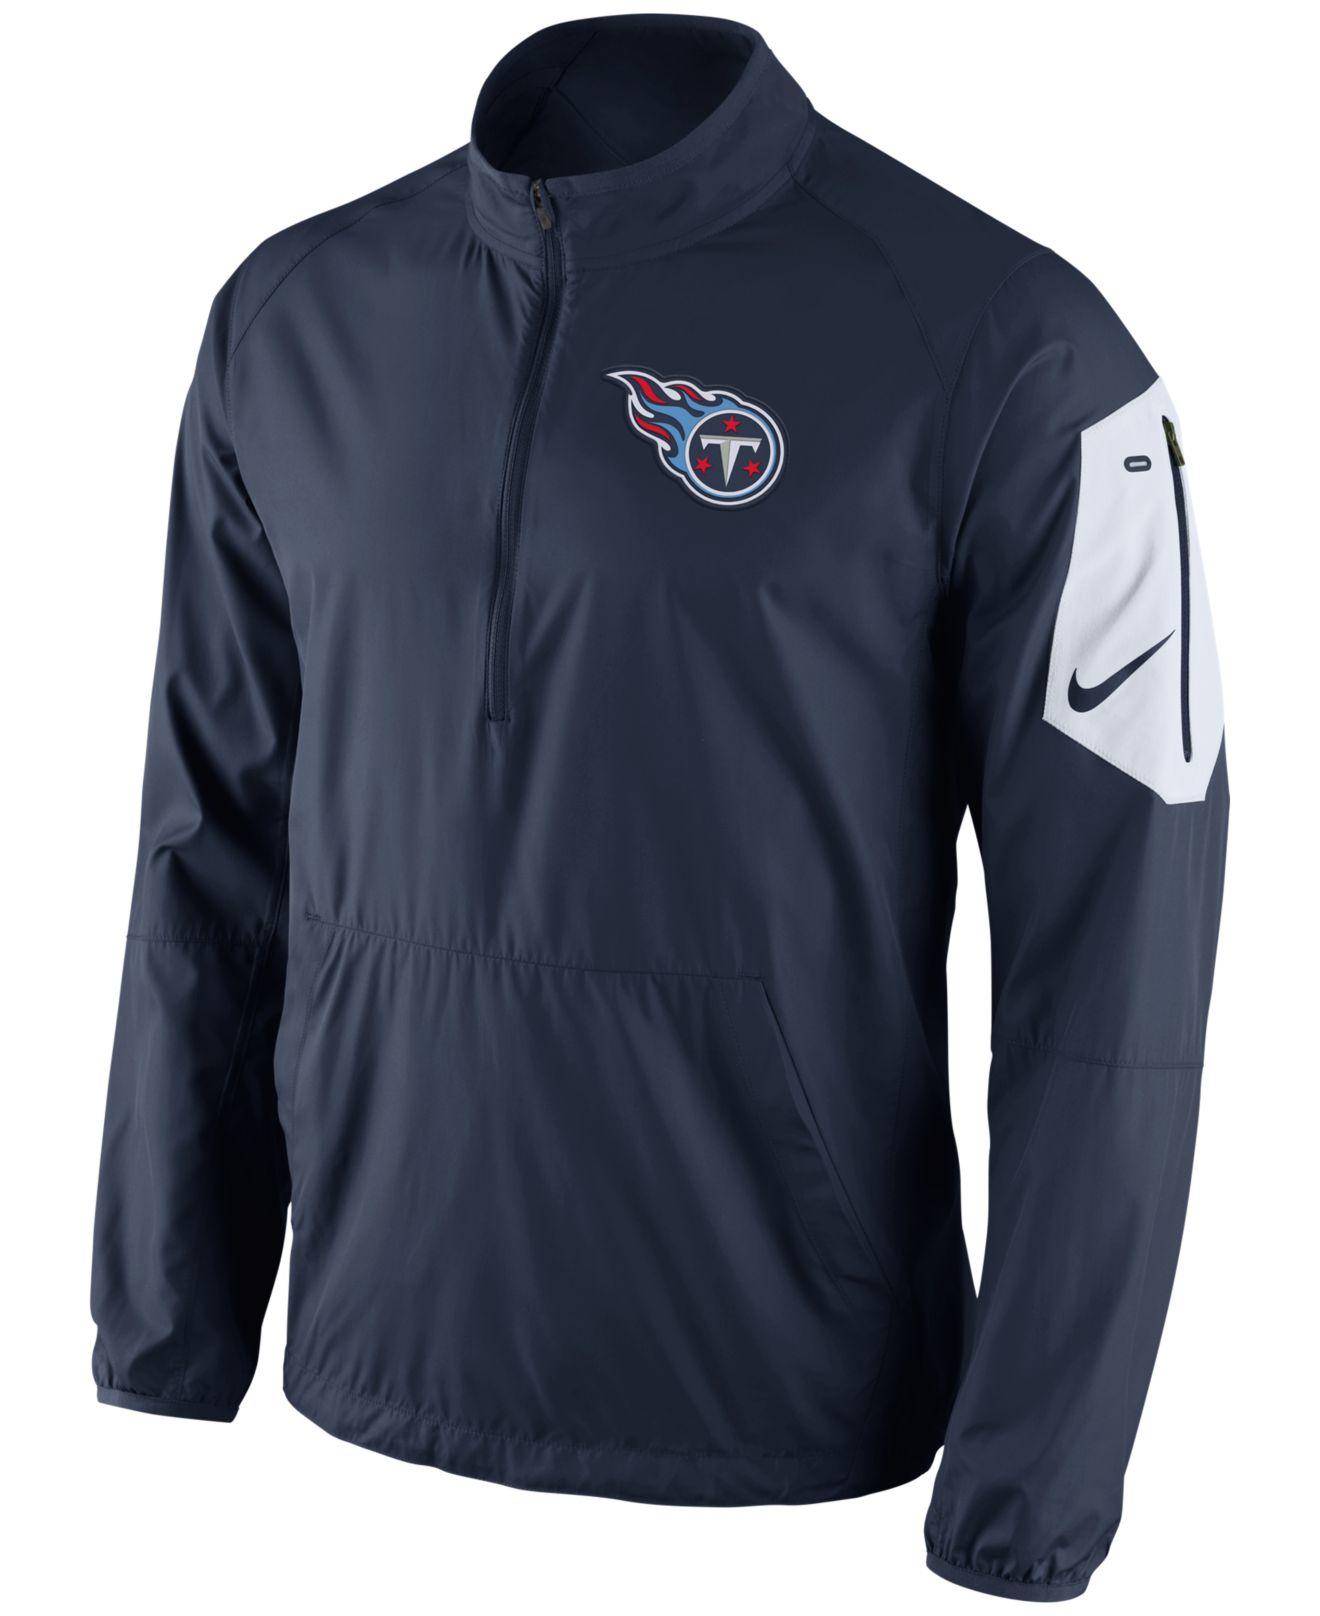 Lyst - Nike Men s Tennessee Titans Lockdown Half-zip Jacket in Blue ... ecc7abbcd